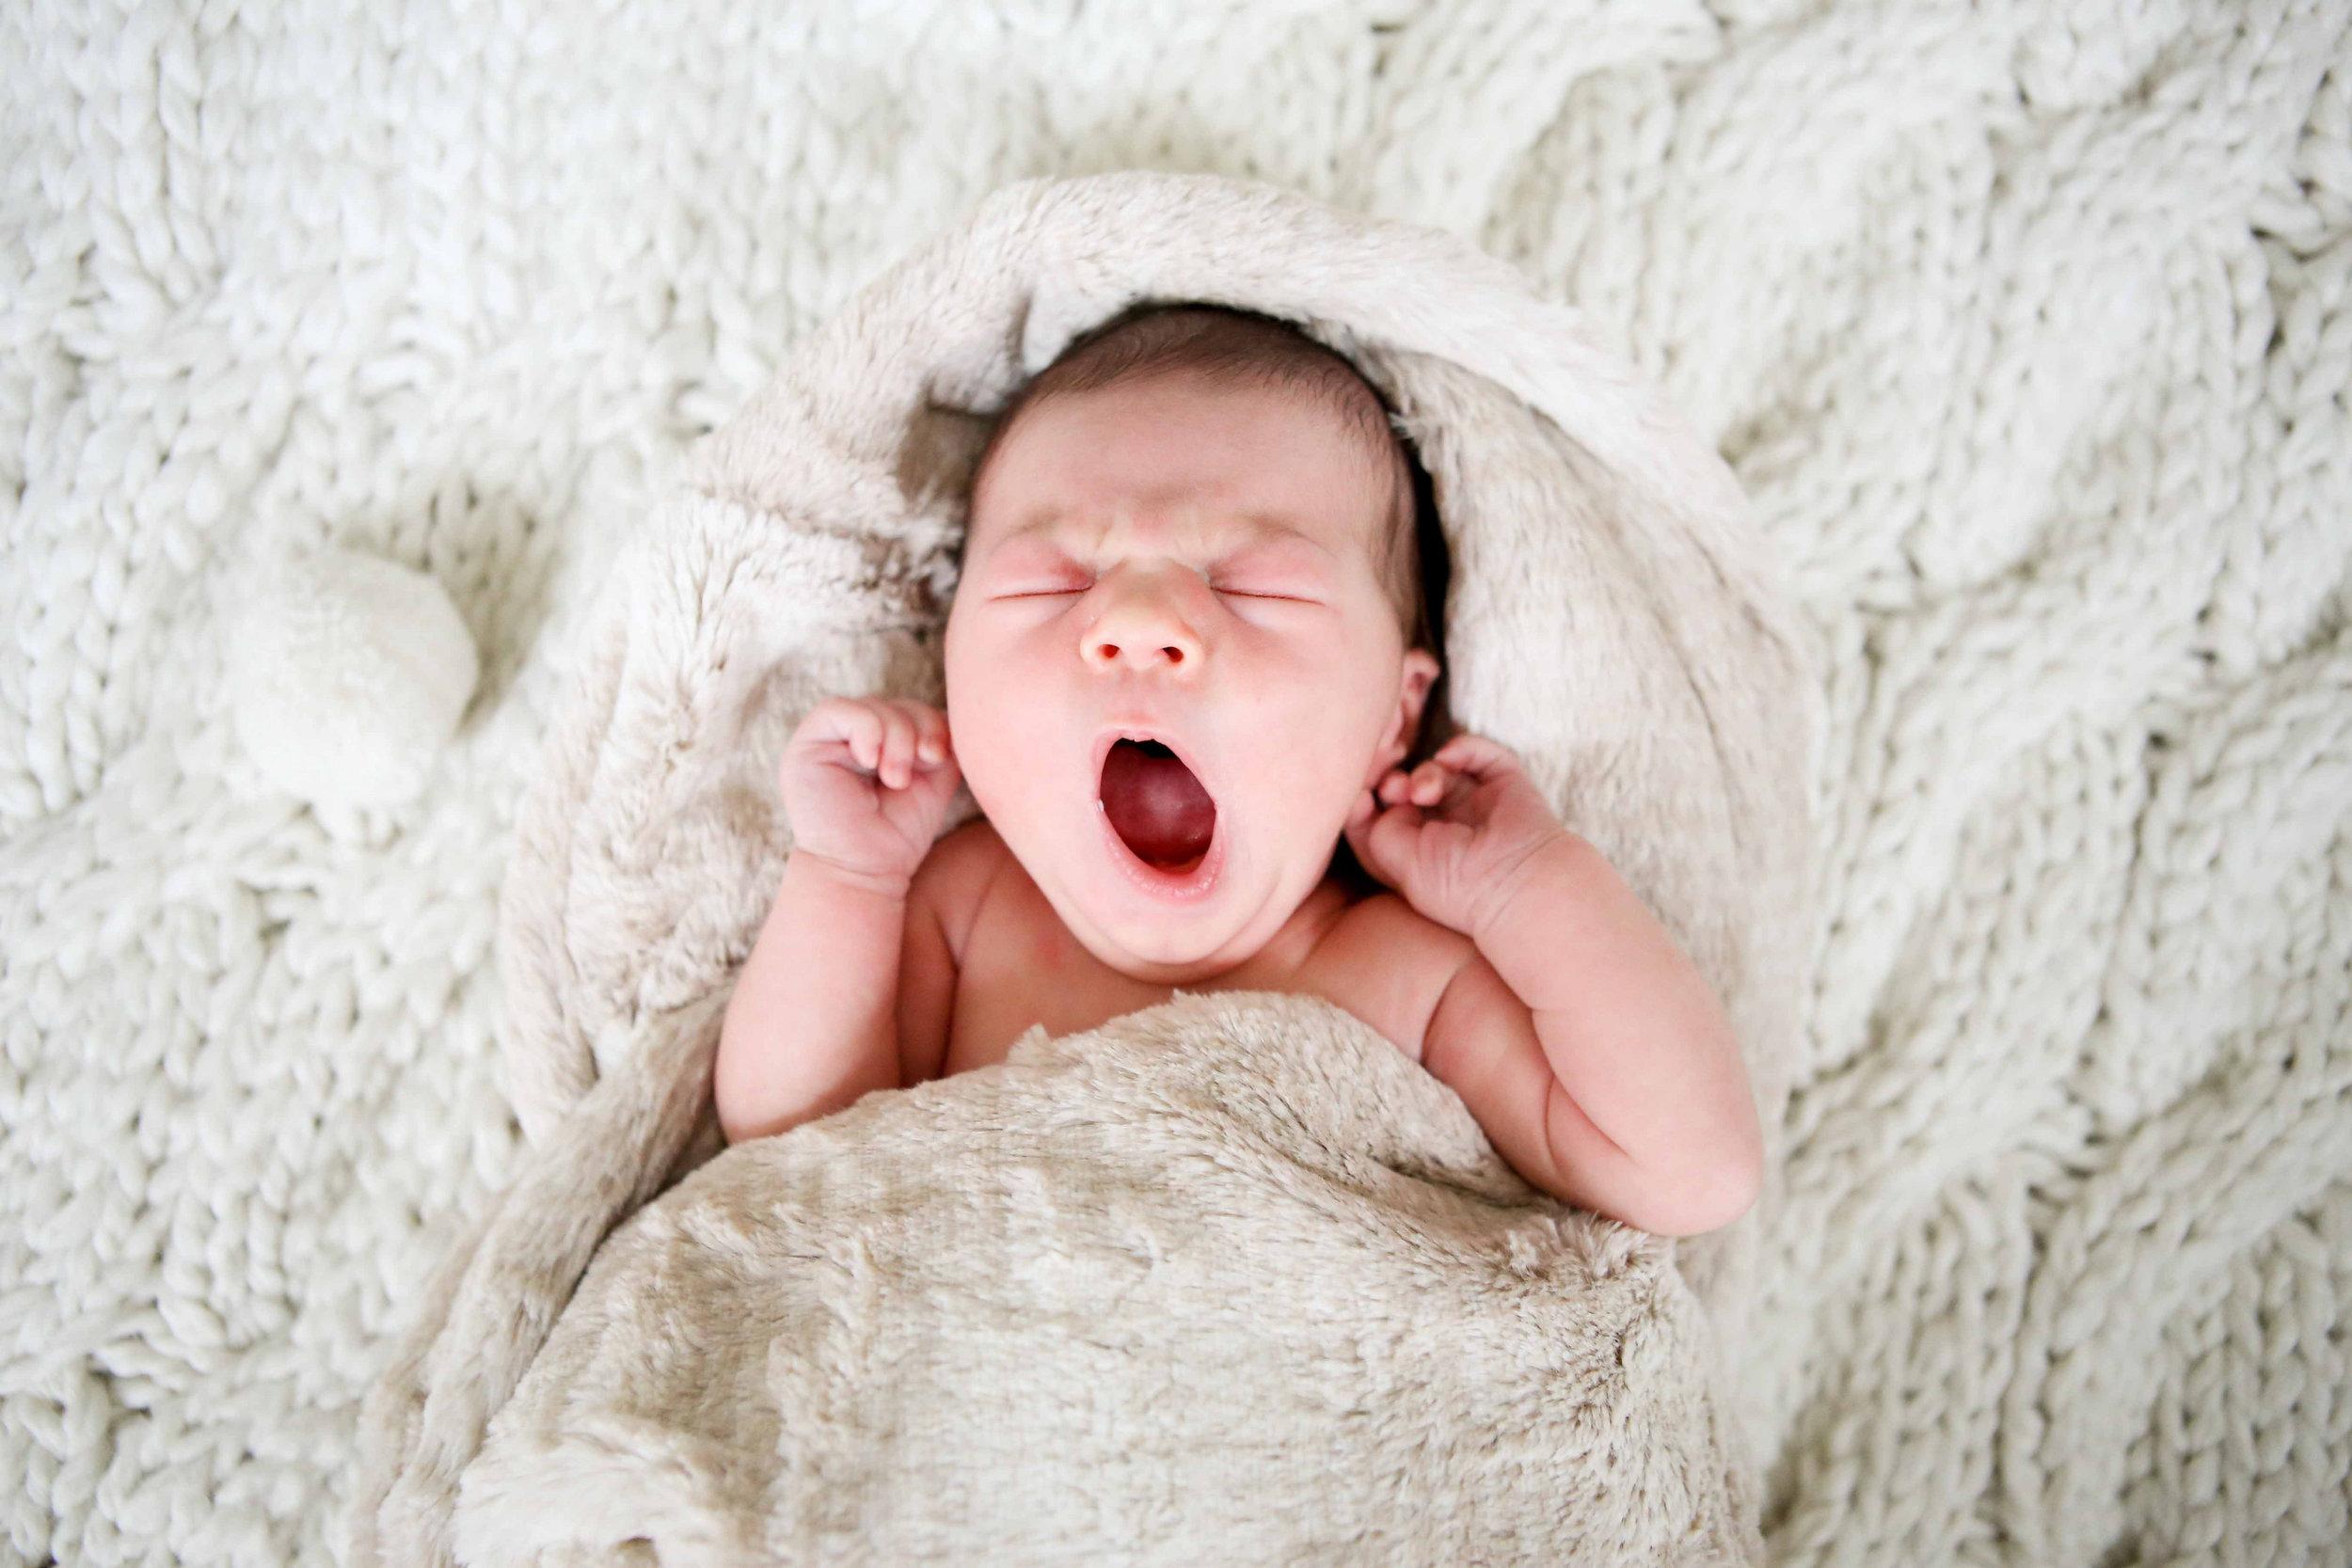 Baby Charlie-Charlie Harper-0054.jpg